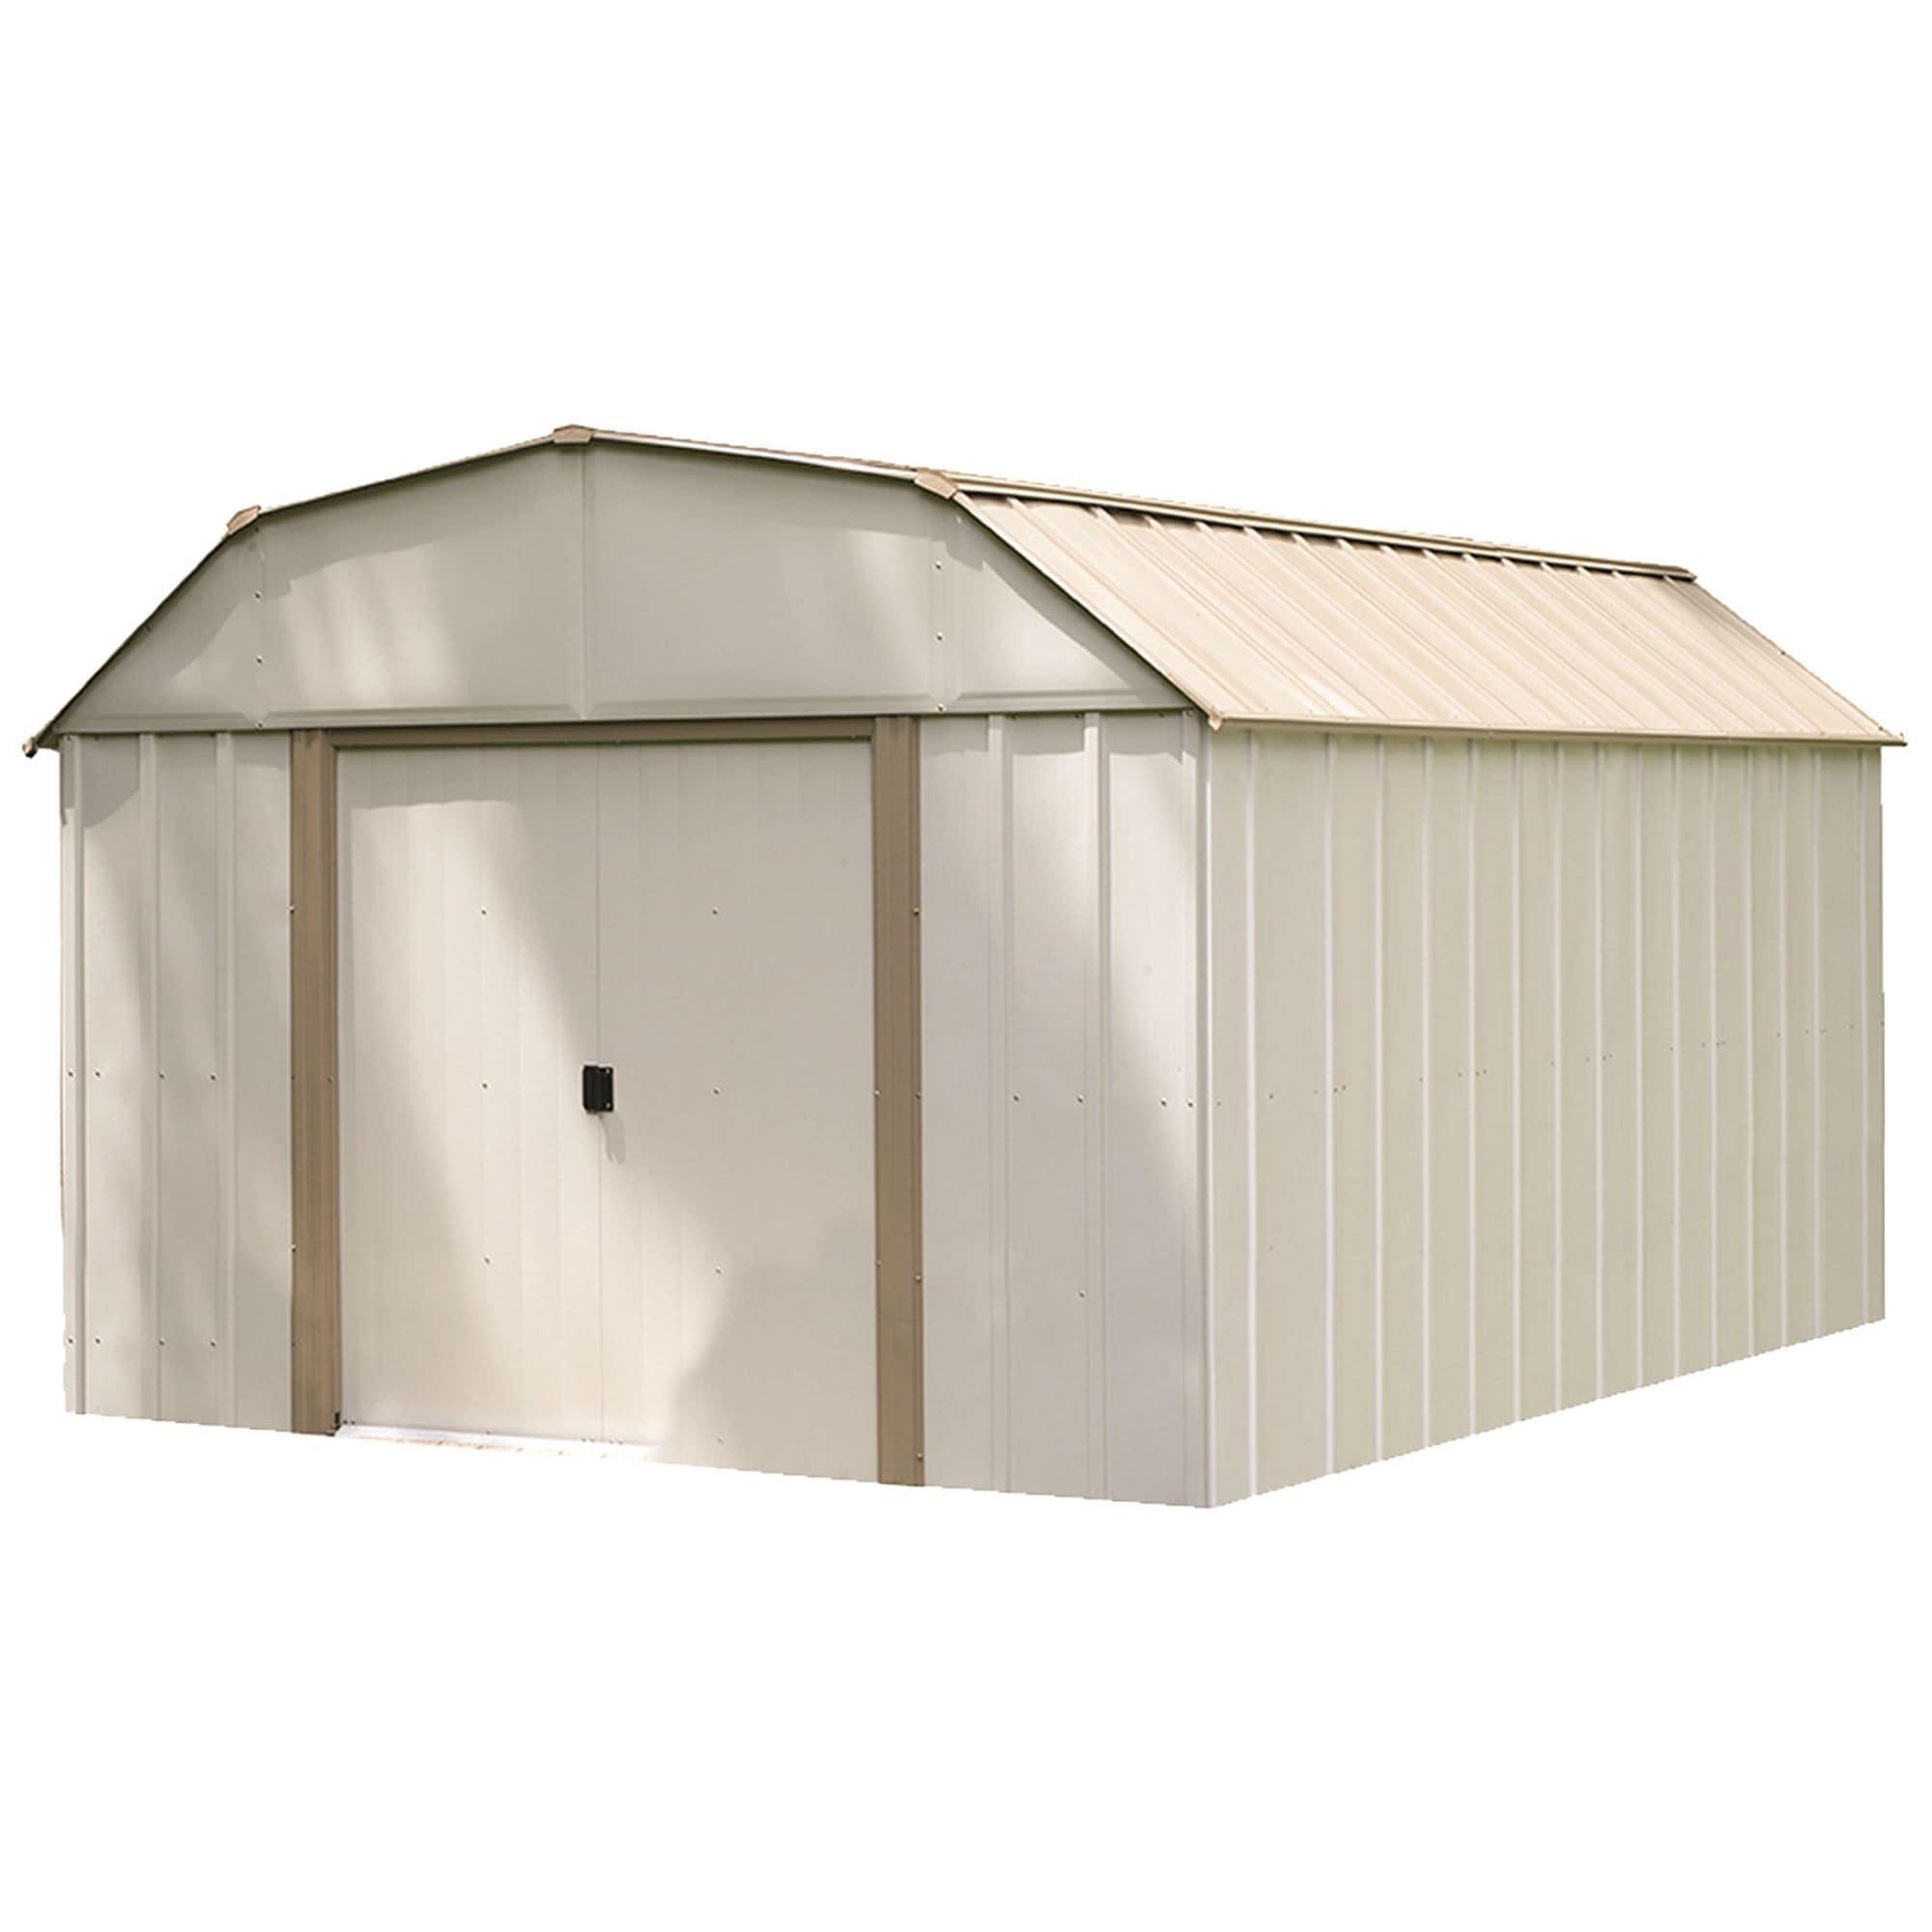 Arrow Group 10 x 14 ft. Barn Style Taupe/ Eggshell Galvan...